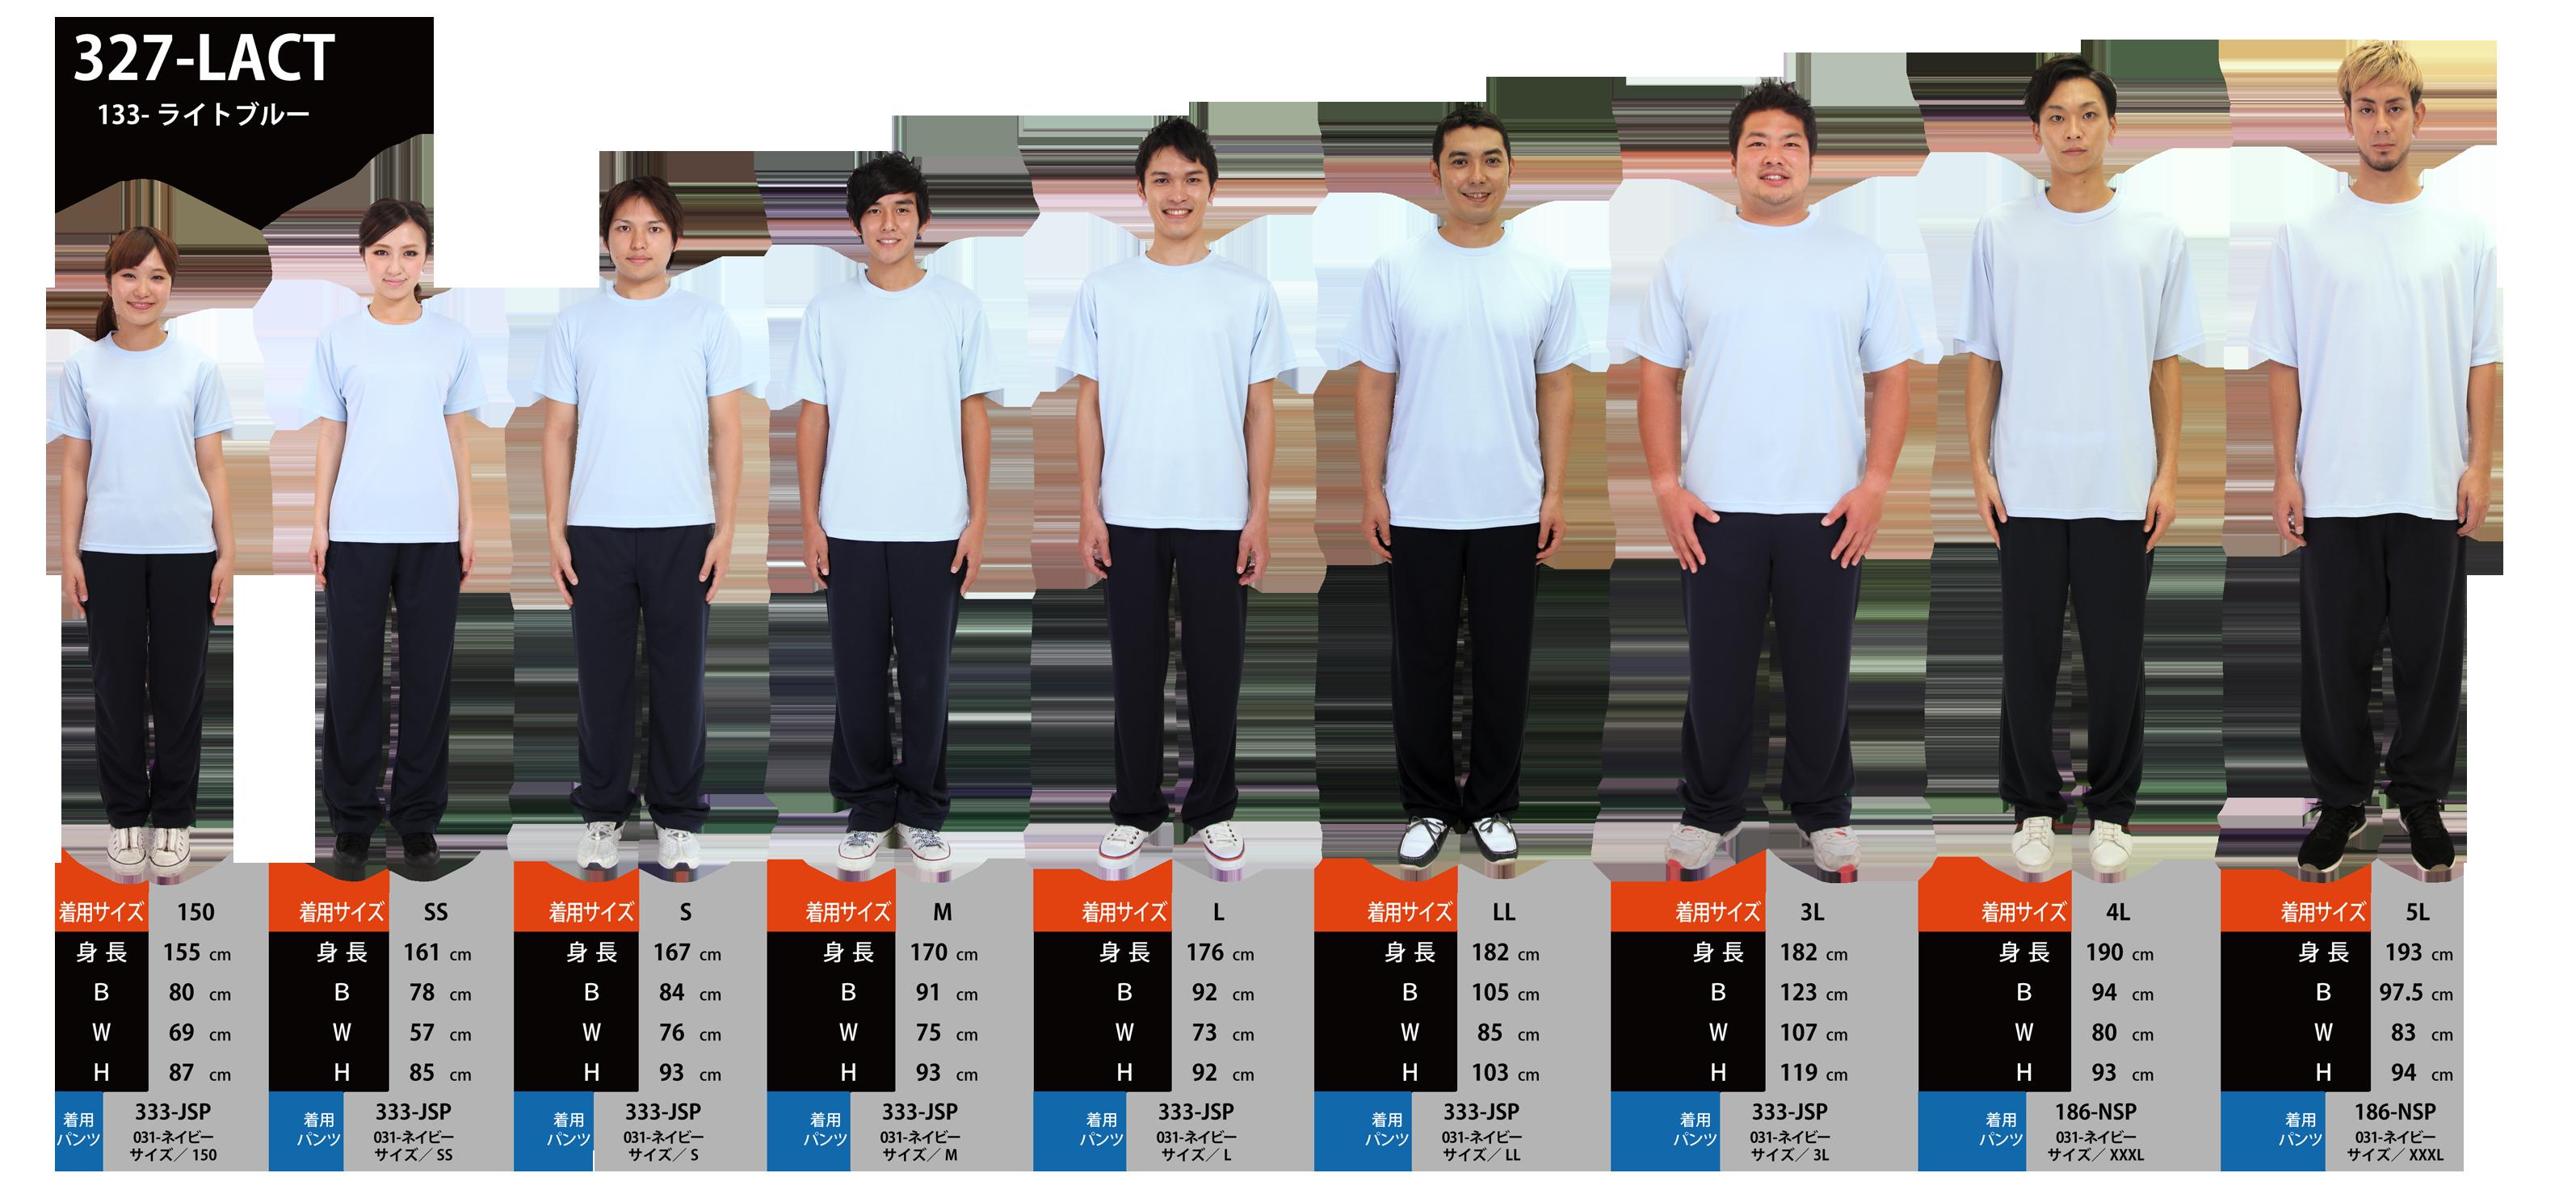 00327-LACT ライトドライTシャツ